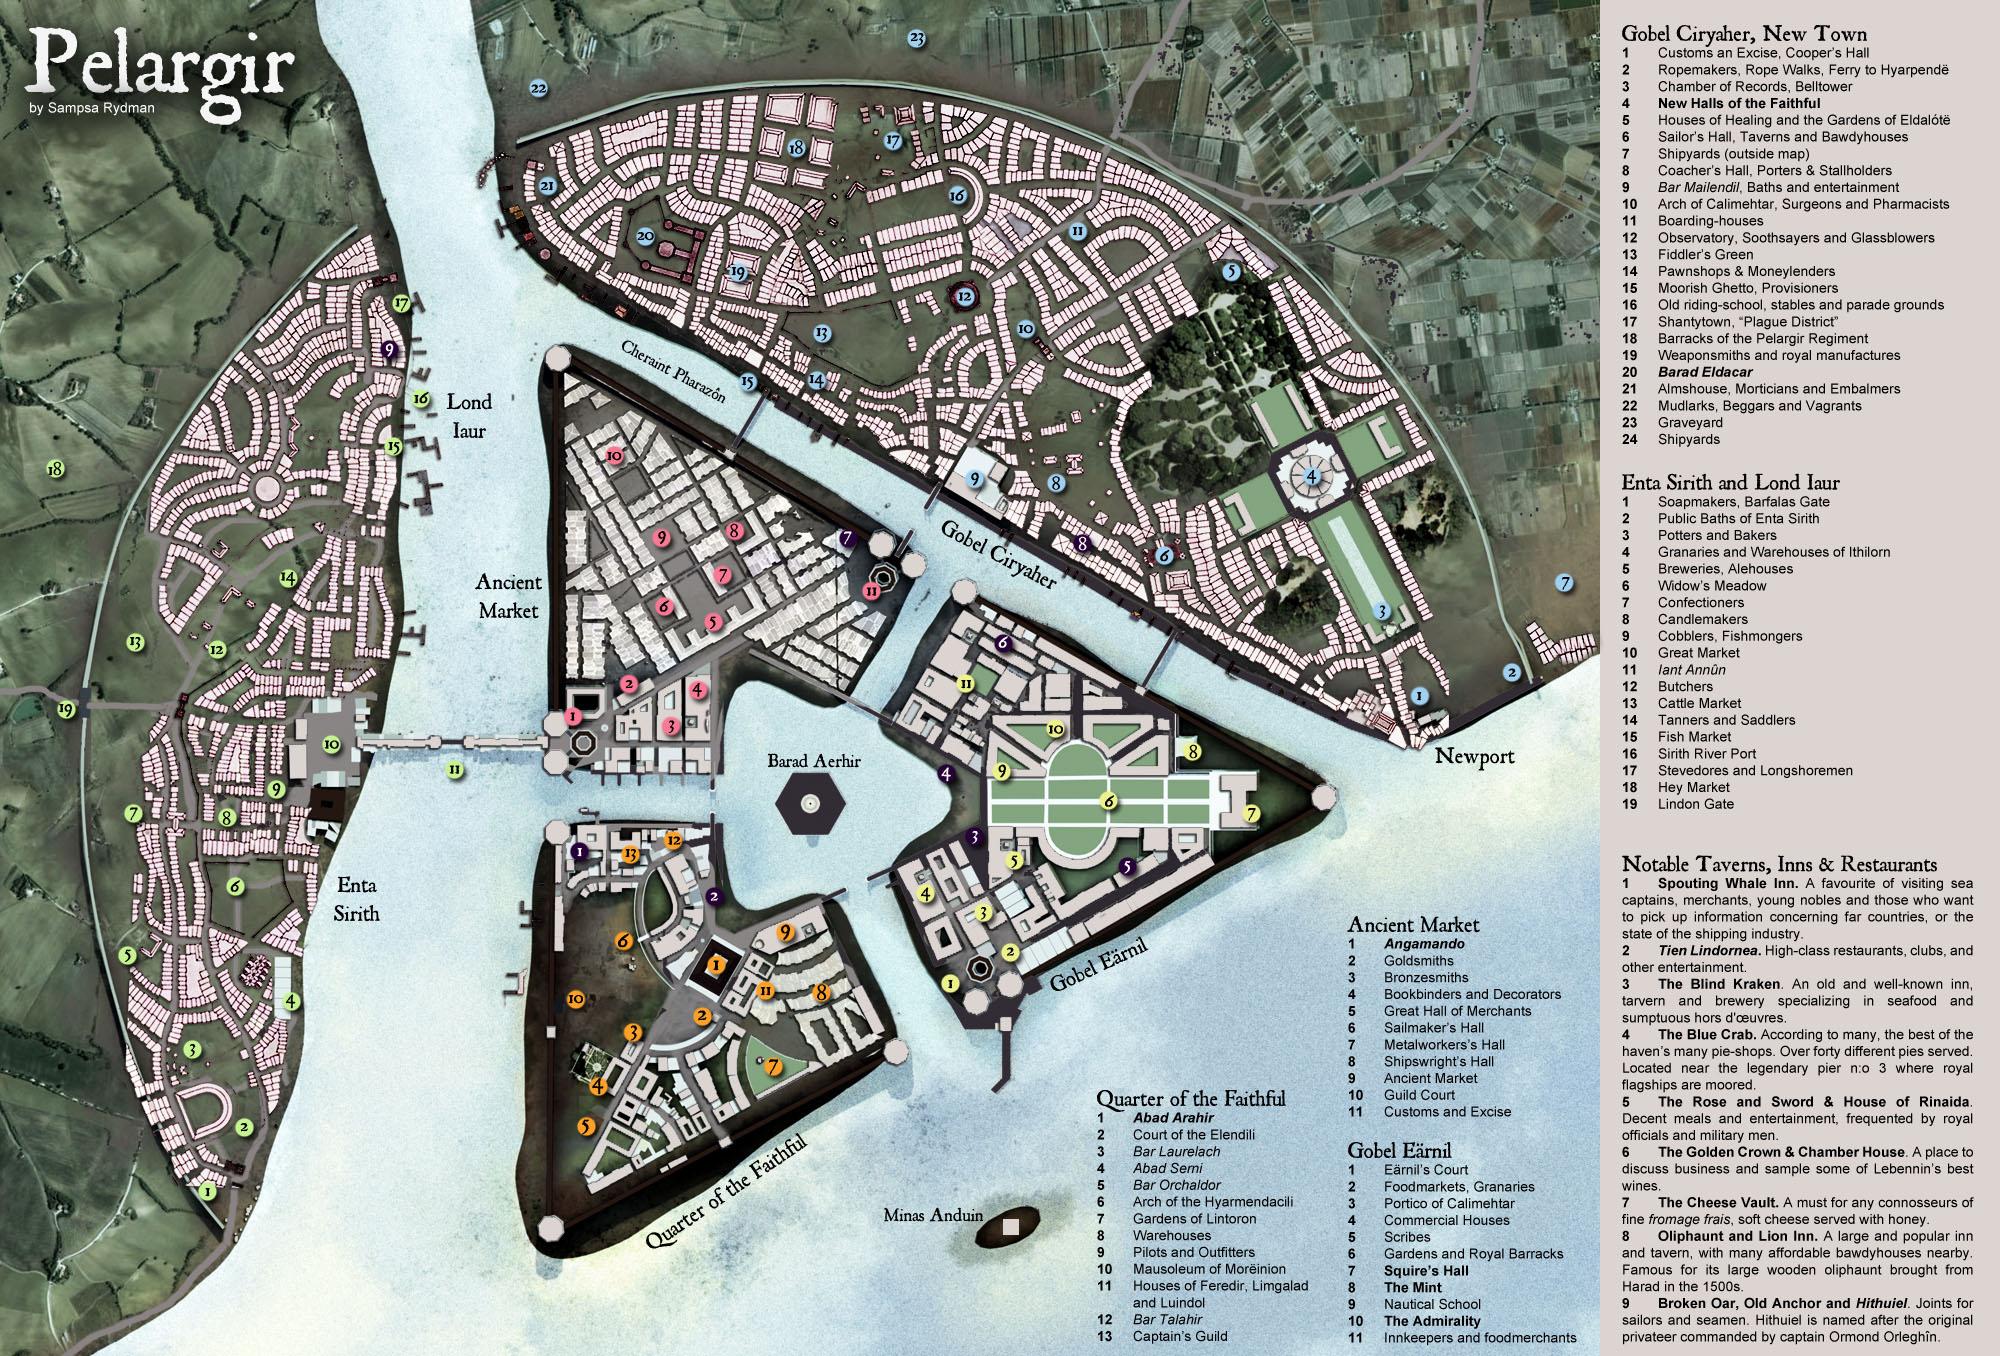 Lindfirion Collection of Maps by Sampsa Rydman